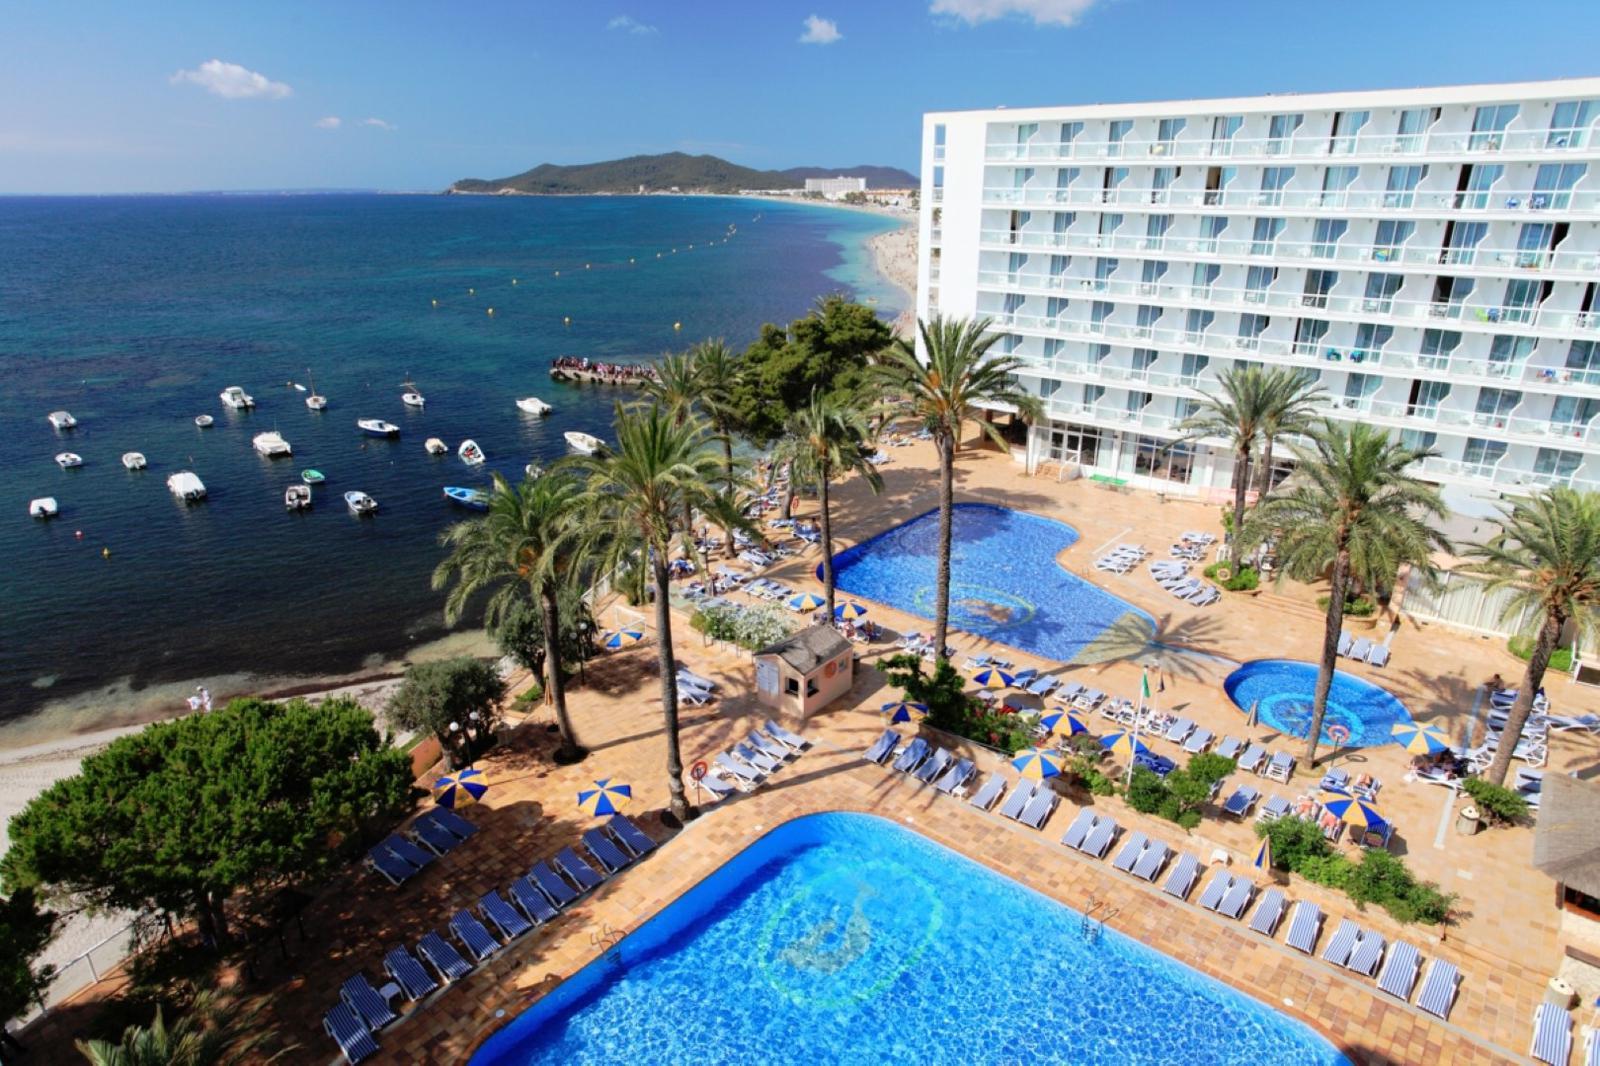 hoteles playa ibiza Sirenis_Hotel_Tres_Carabelas_Spa_panoramic_01 (Large)